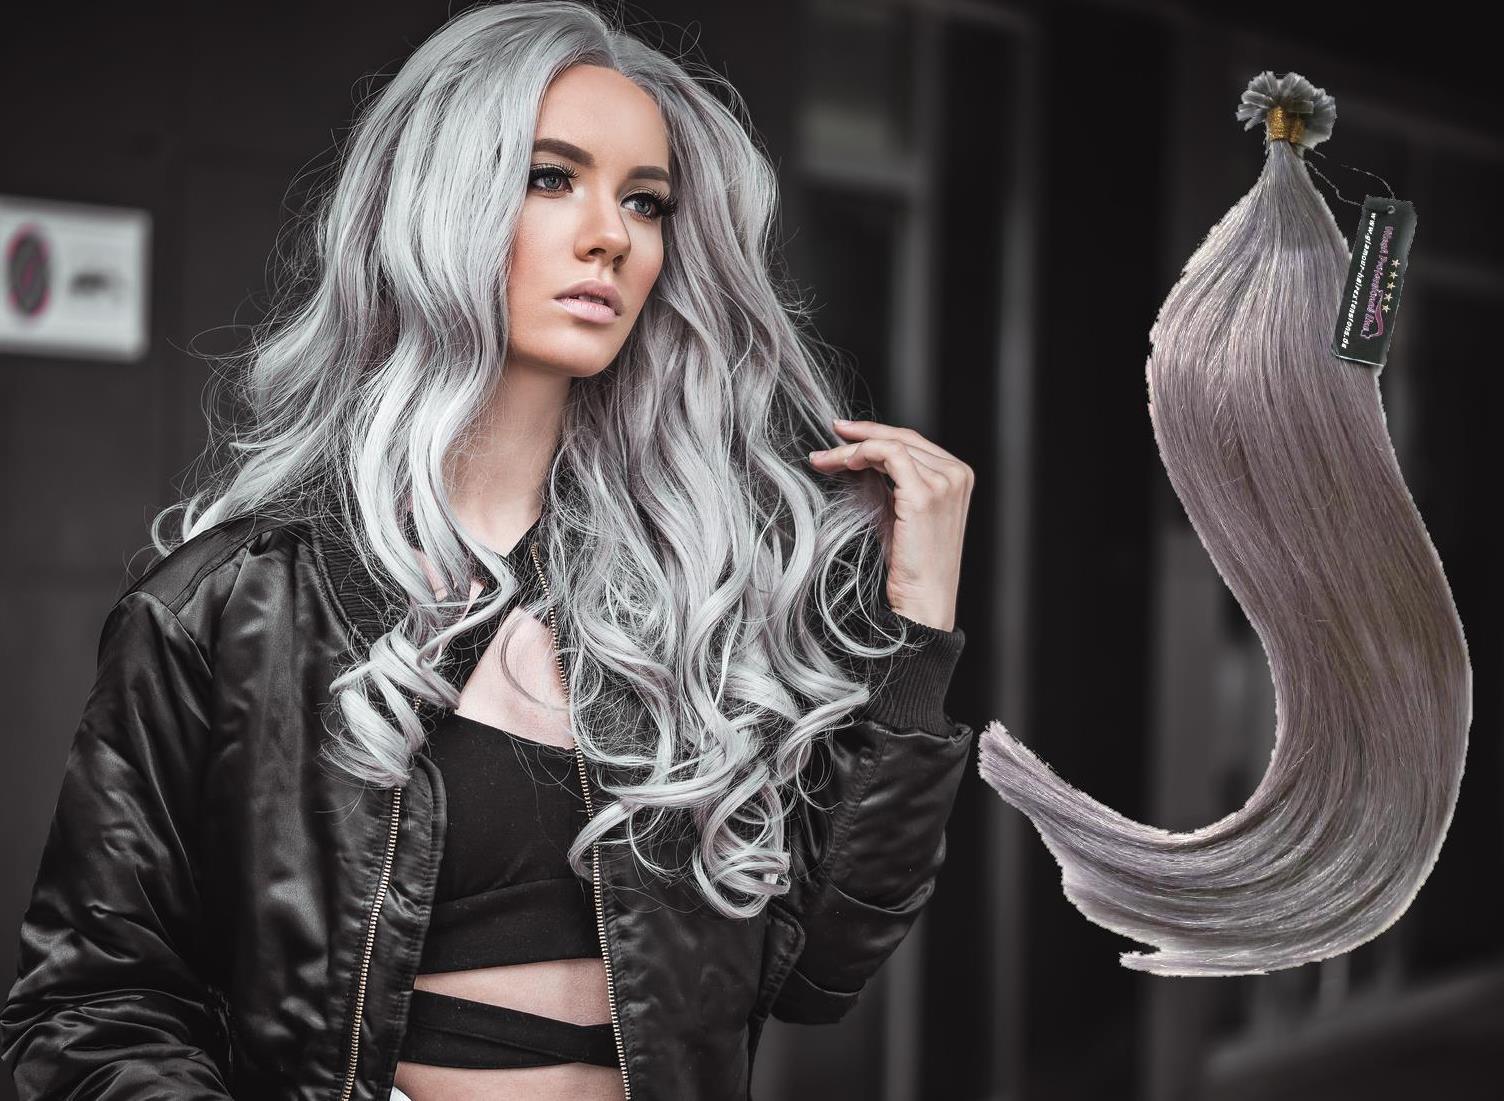 100 human hair remy echthaar extensions haarverl ngerung keratin bonding grey ebay. Black Bedroom Furniture Sets. Home Design Ideas